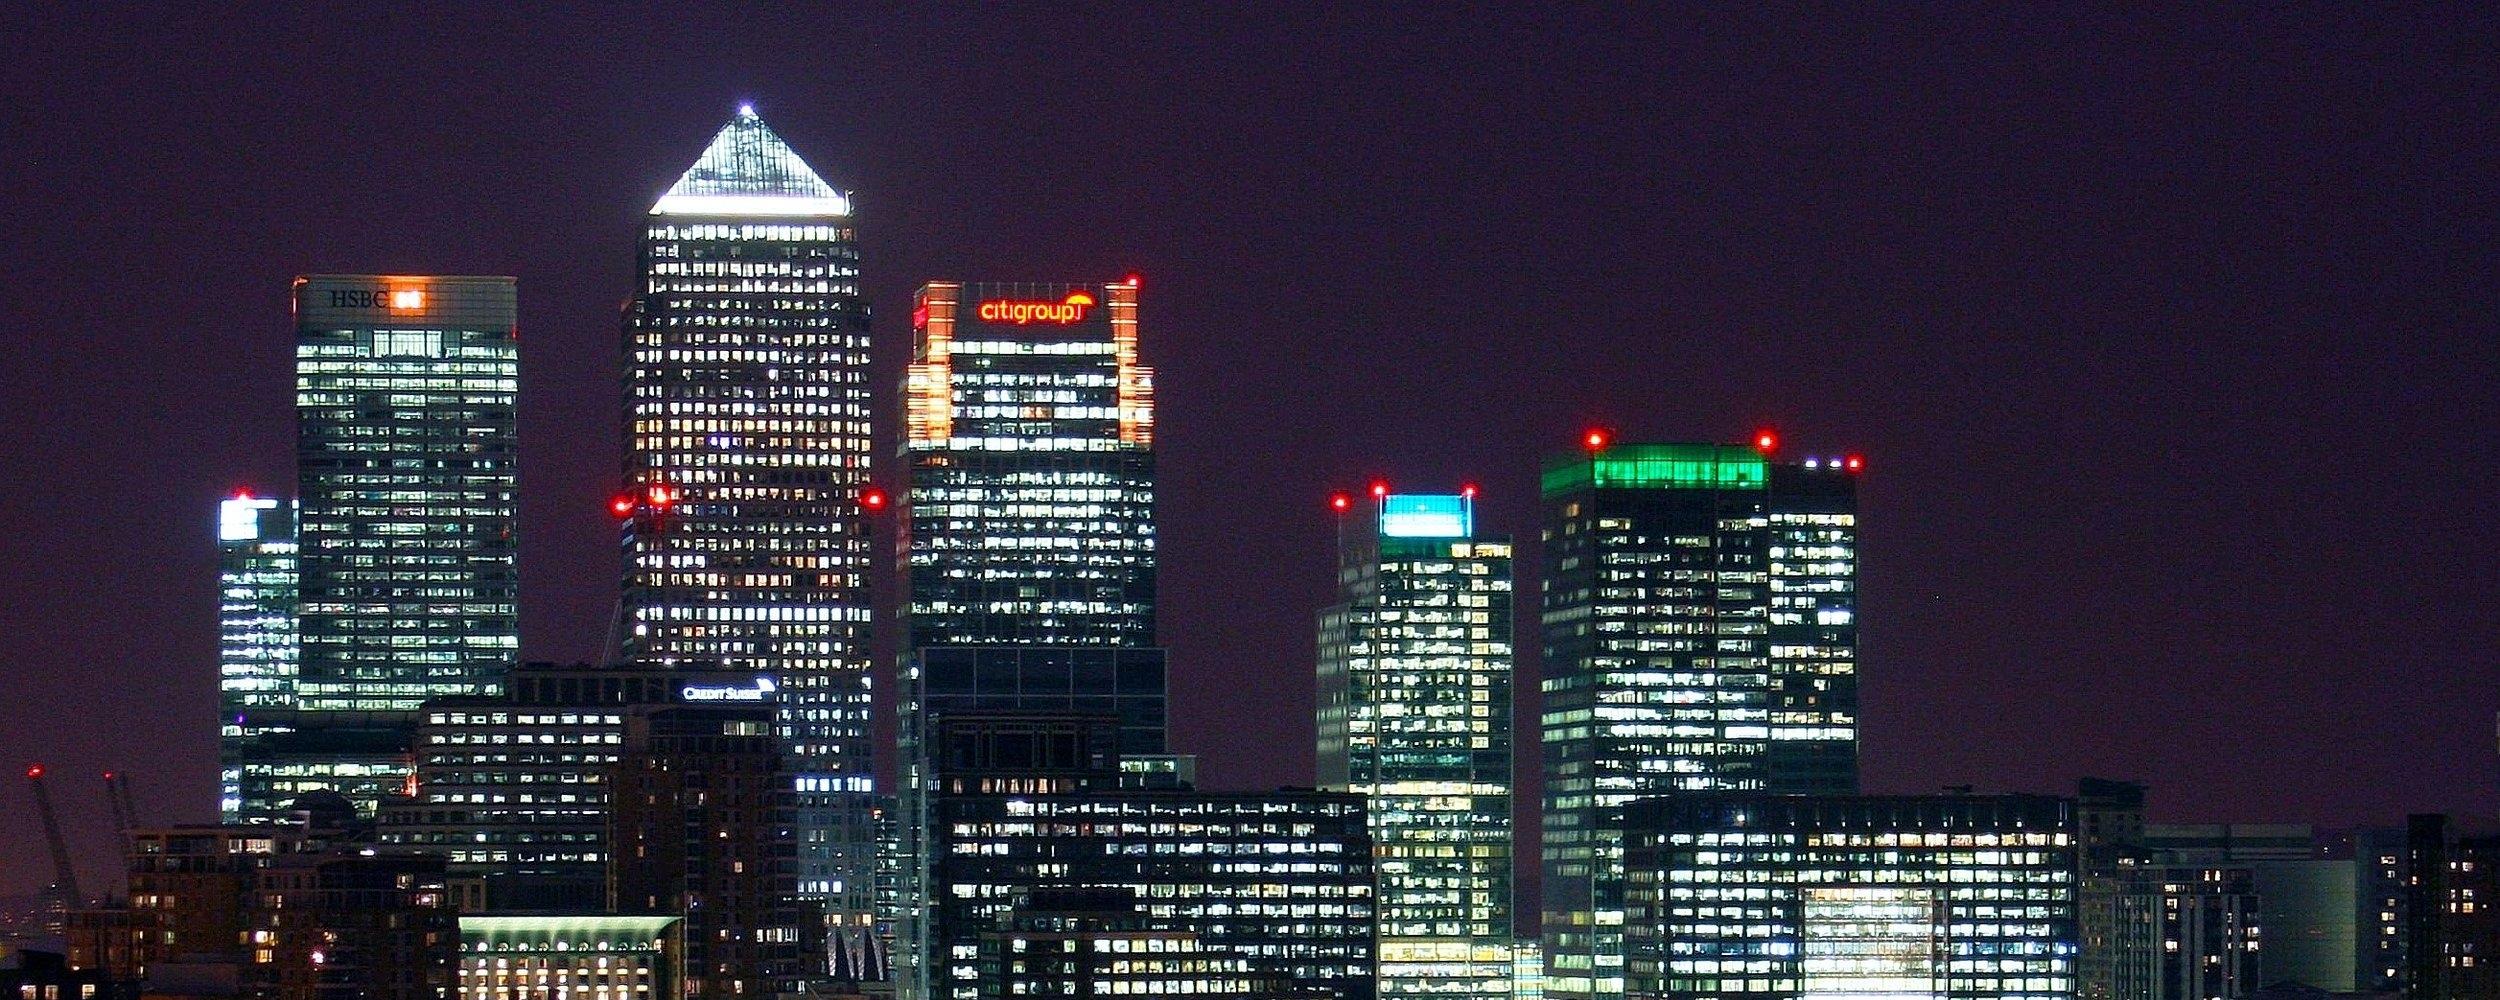 city-building-night-view-night-88514.jpeg